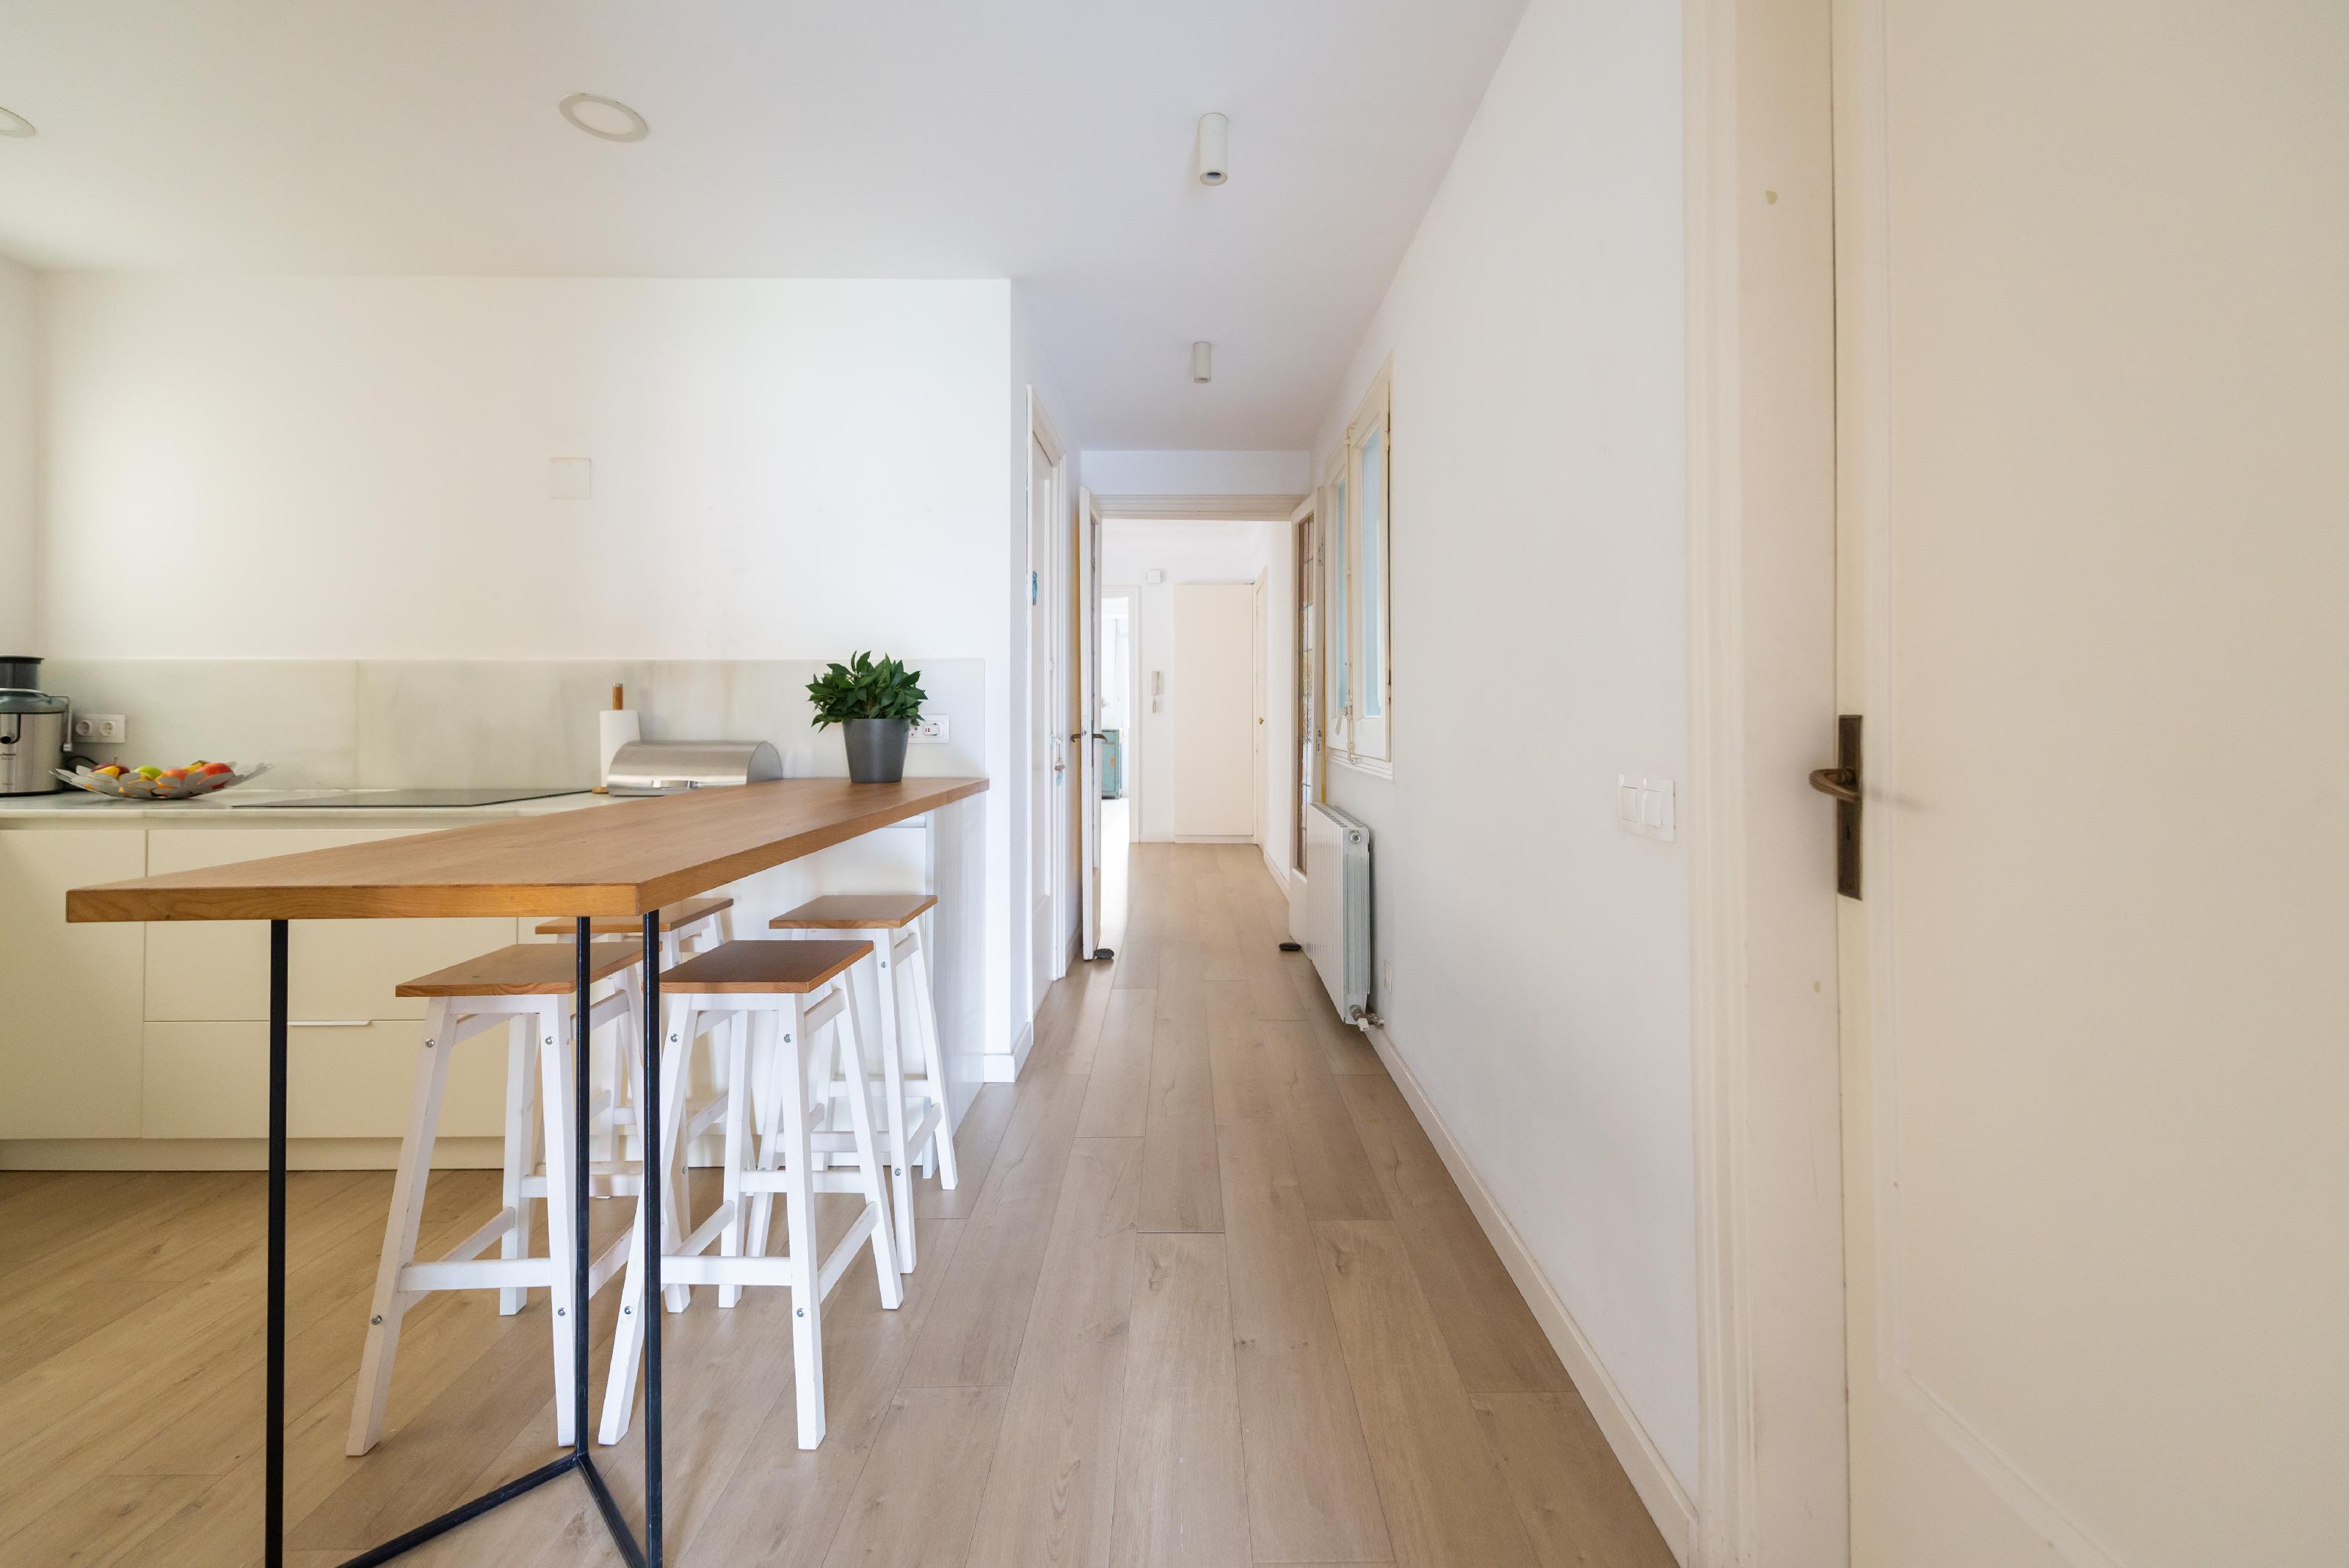 250005 Flat for sale in Sarrià-Sant Gervasi, Sant Gervasi-Galvany 23